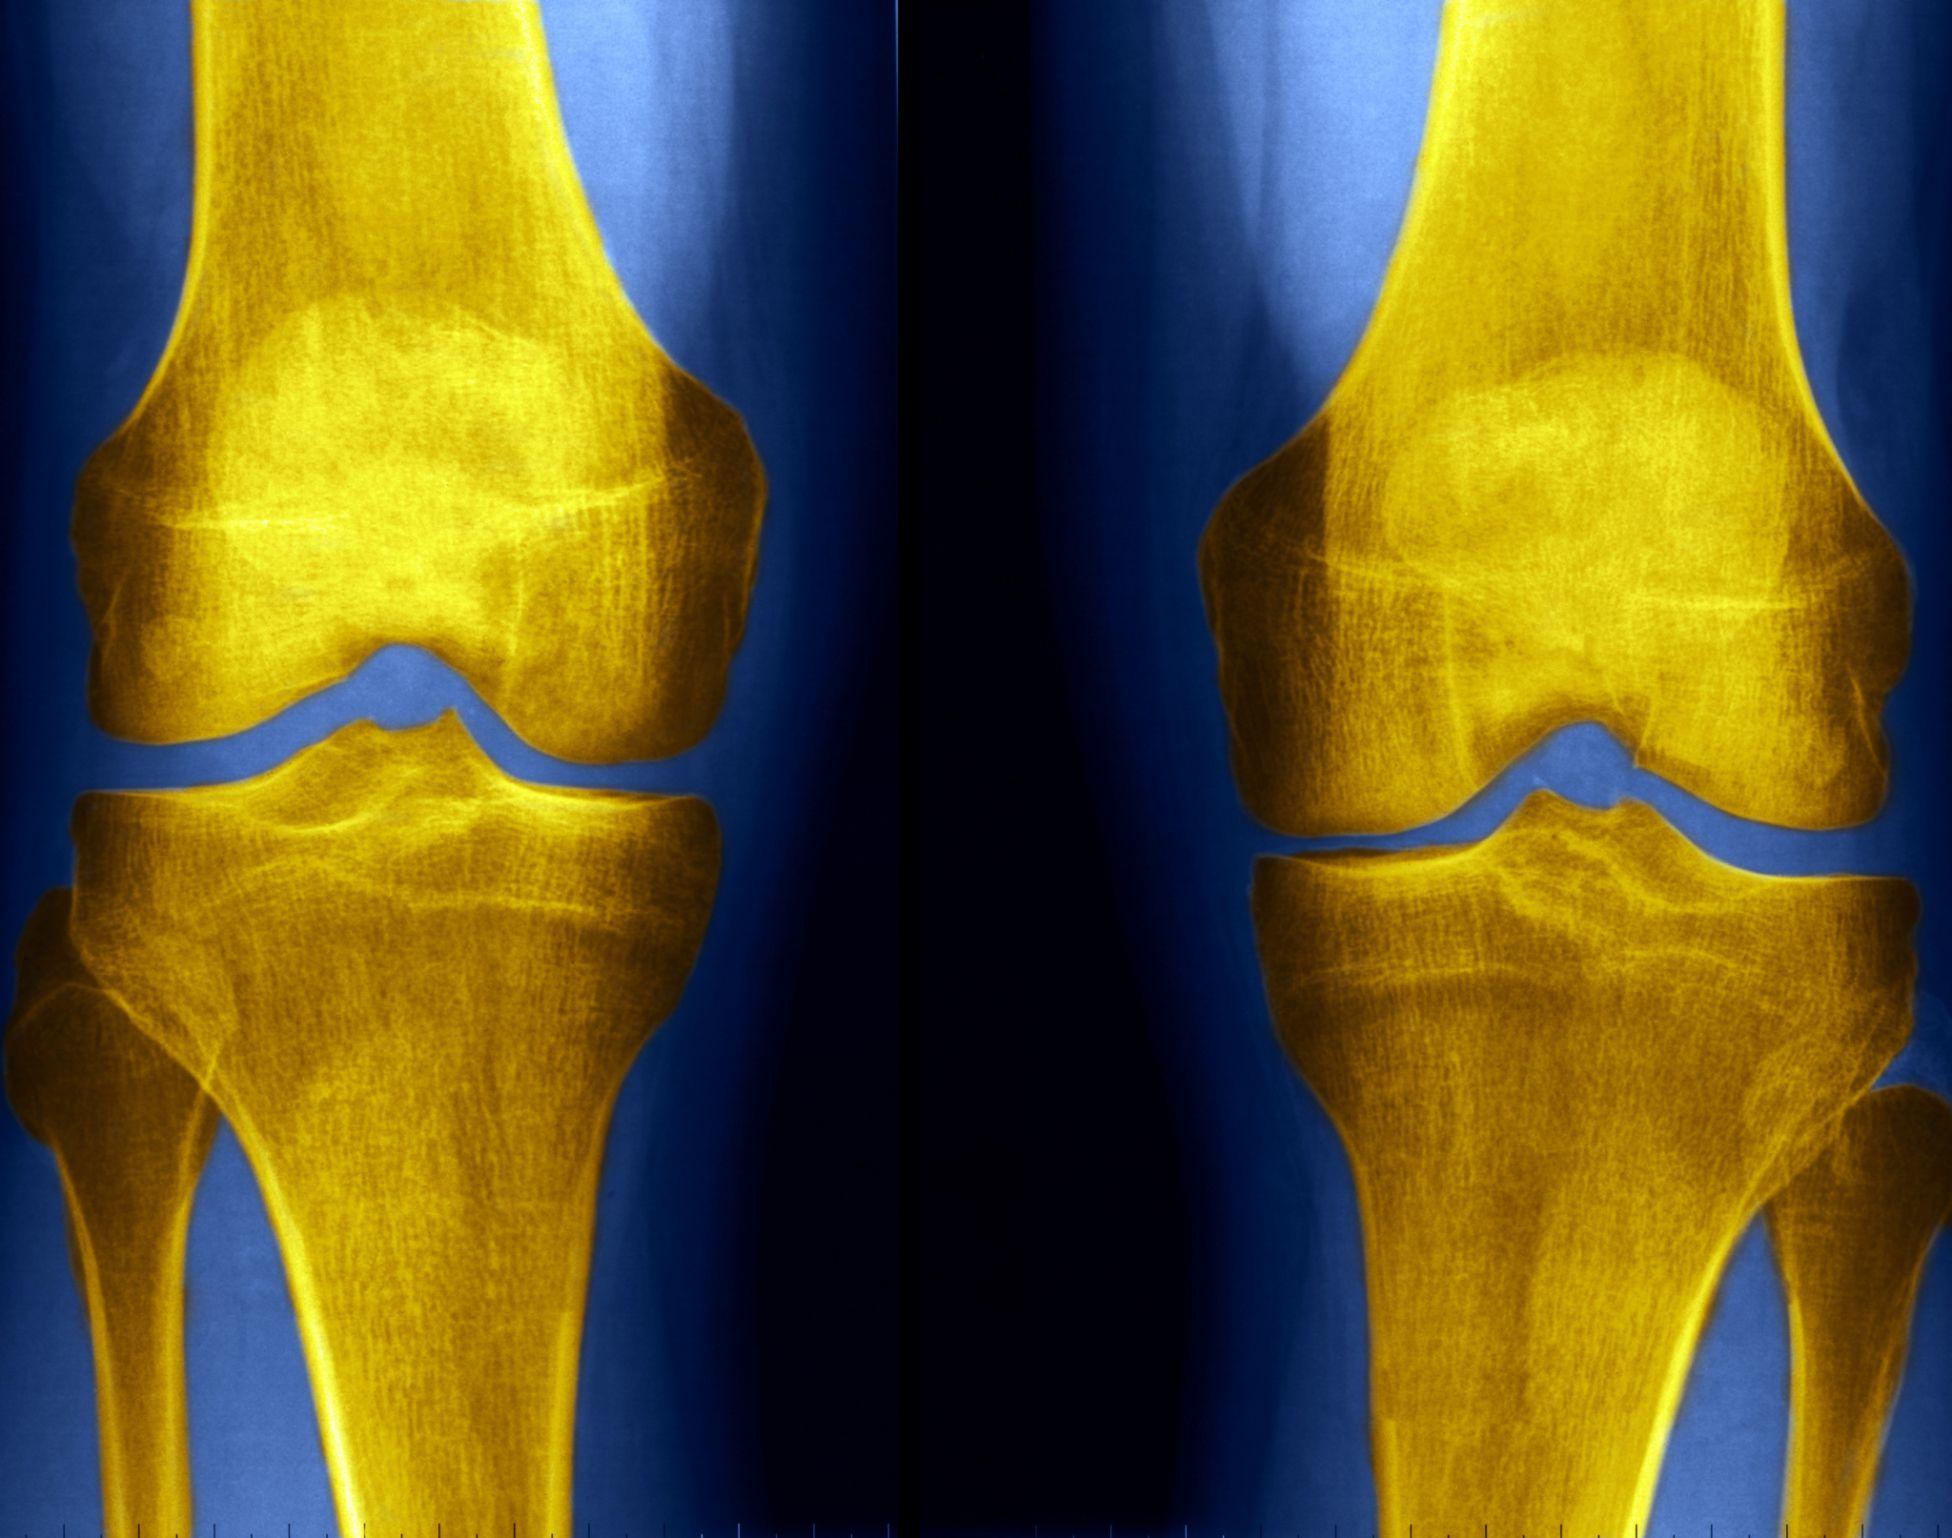 Knee X Rays And Detecting Abnormalities